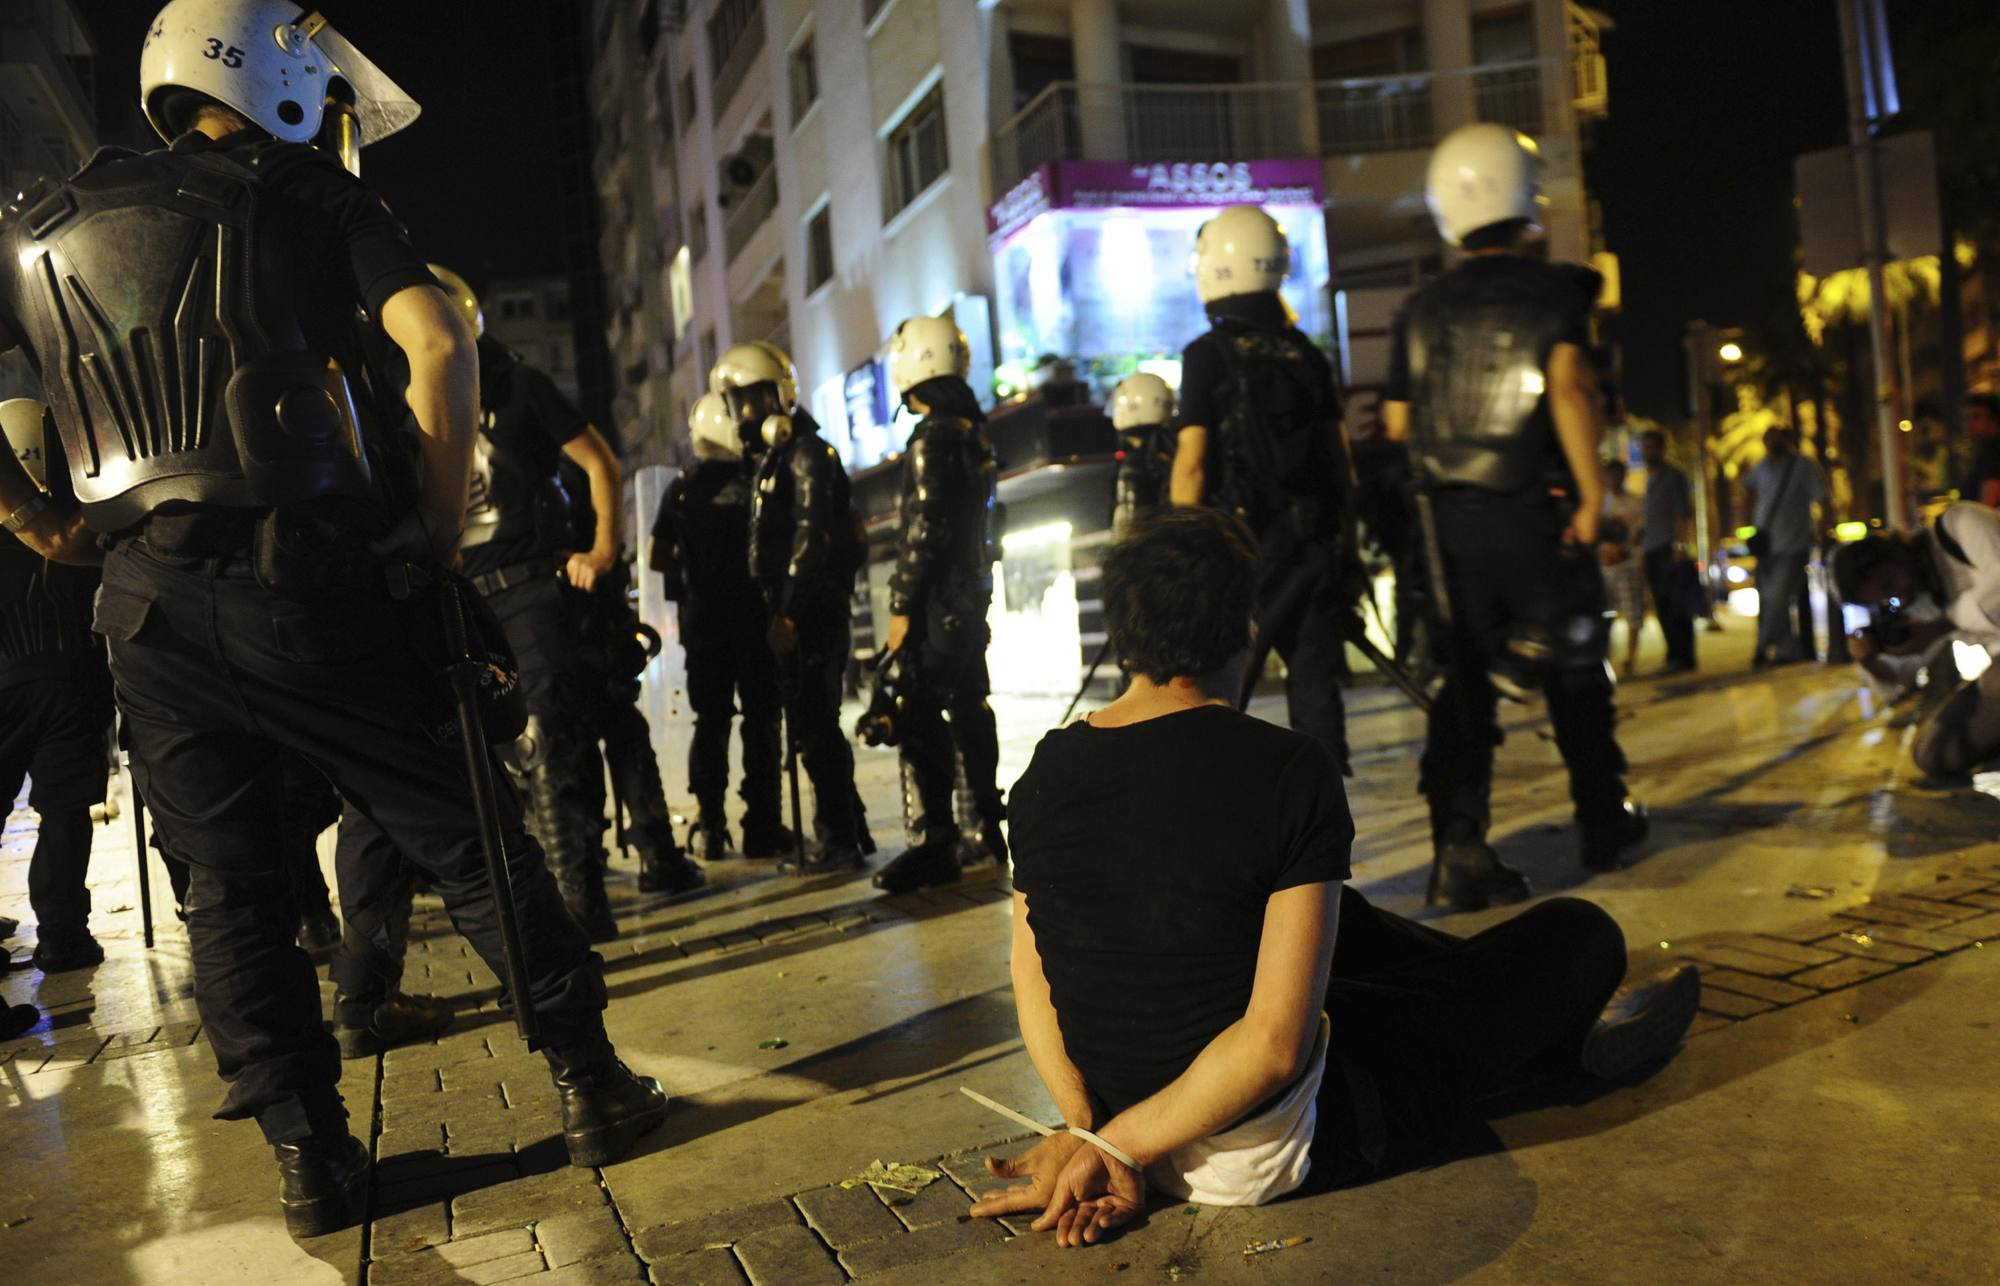 Incidenti anche a Smirne (Reuters)